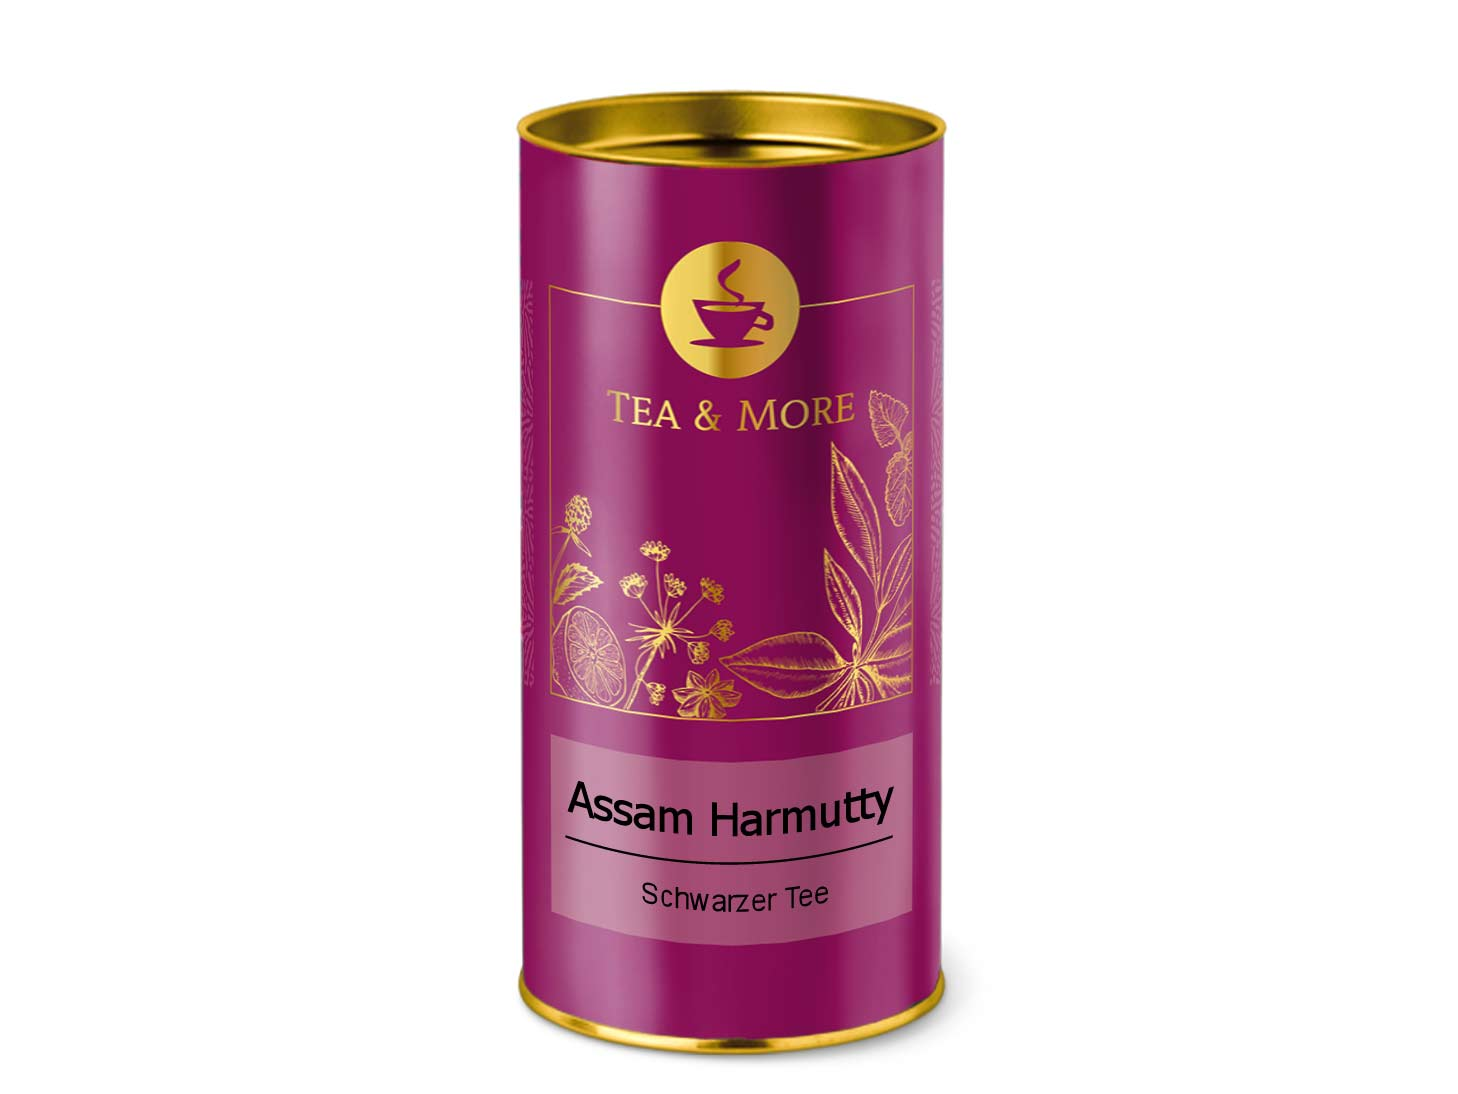 Assam Harmutty